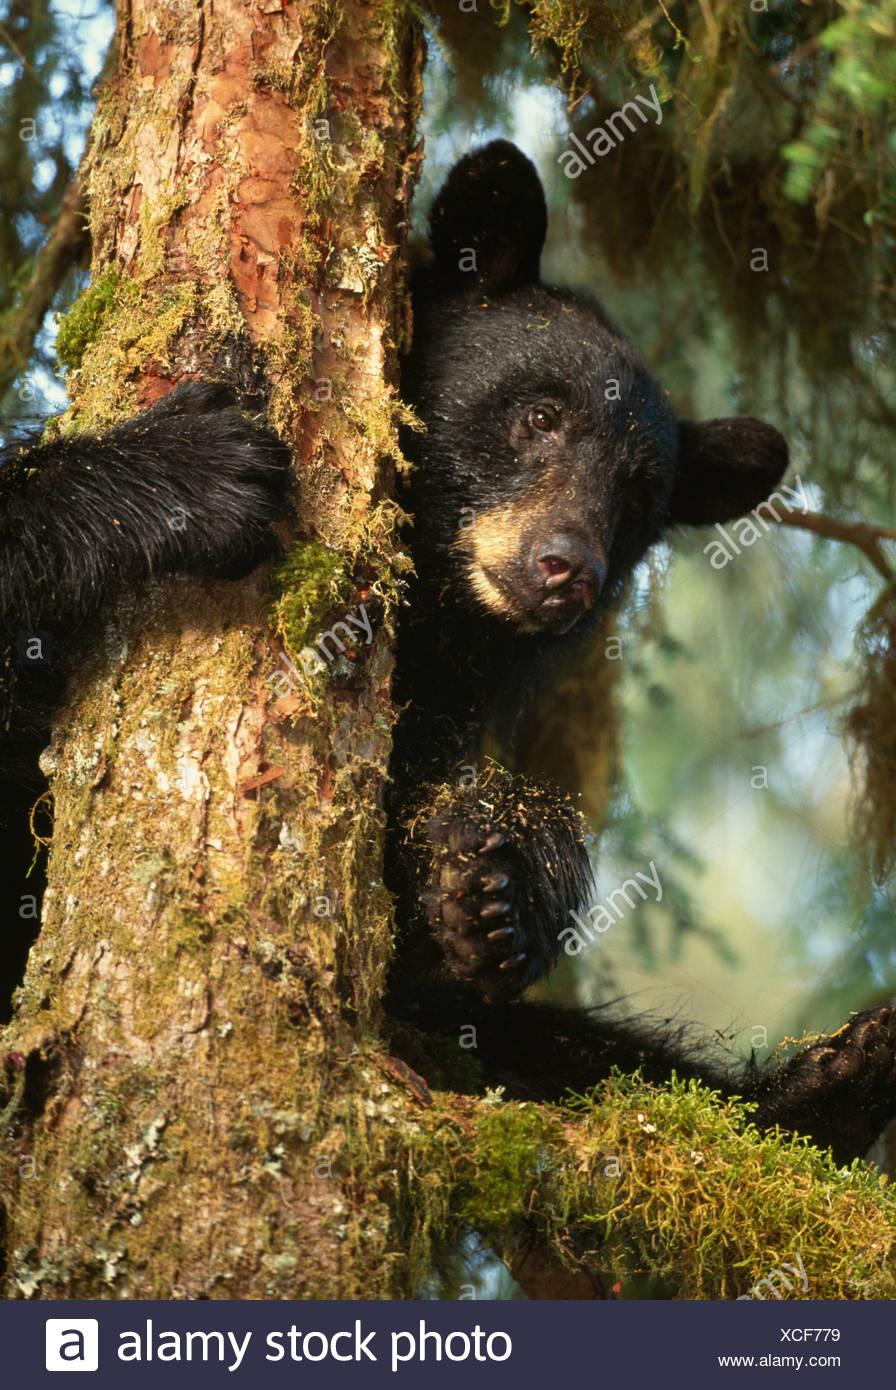 Black Bear climbs in a mossy rainforest tree, Alaska - Stock Image